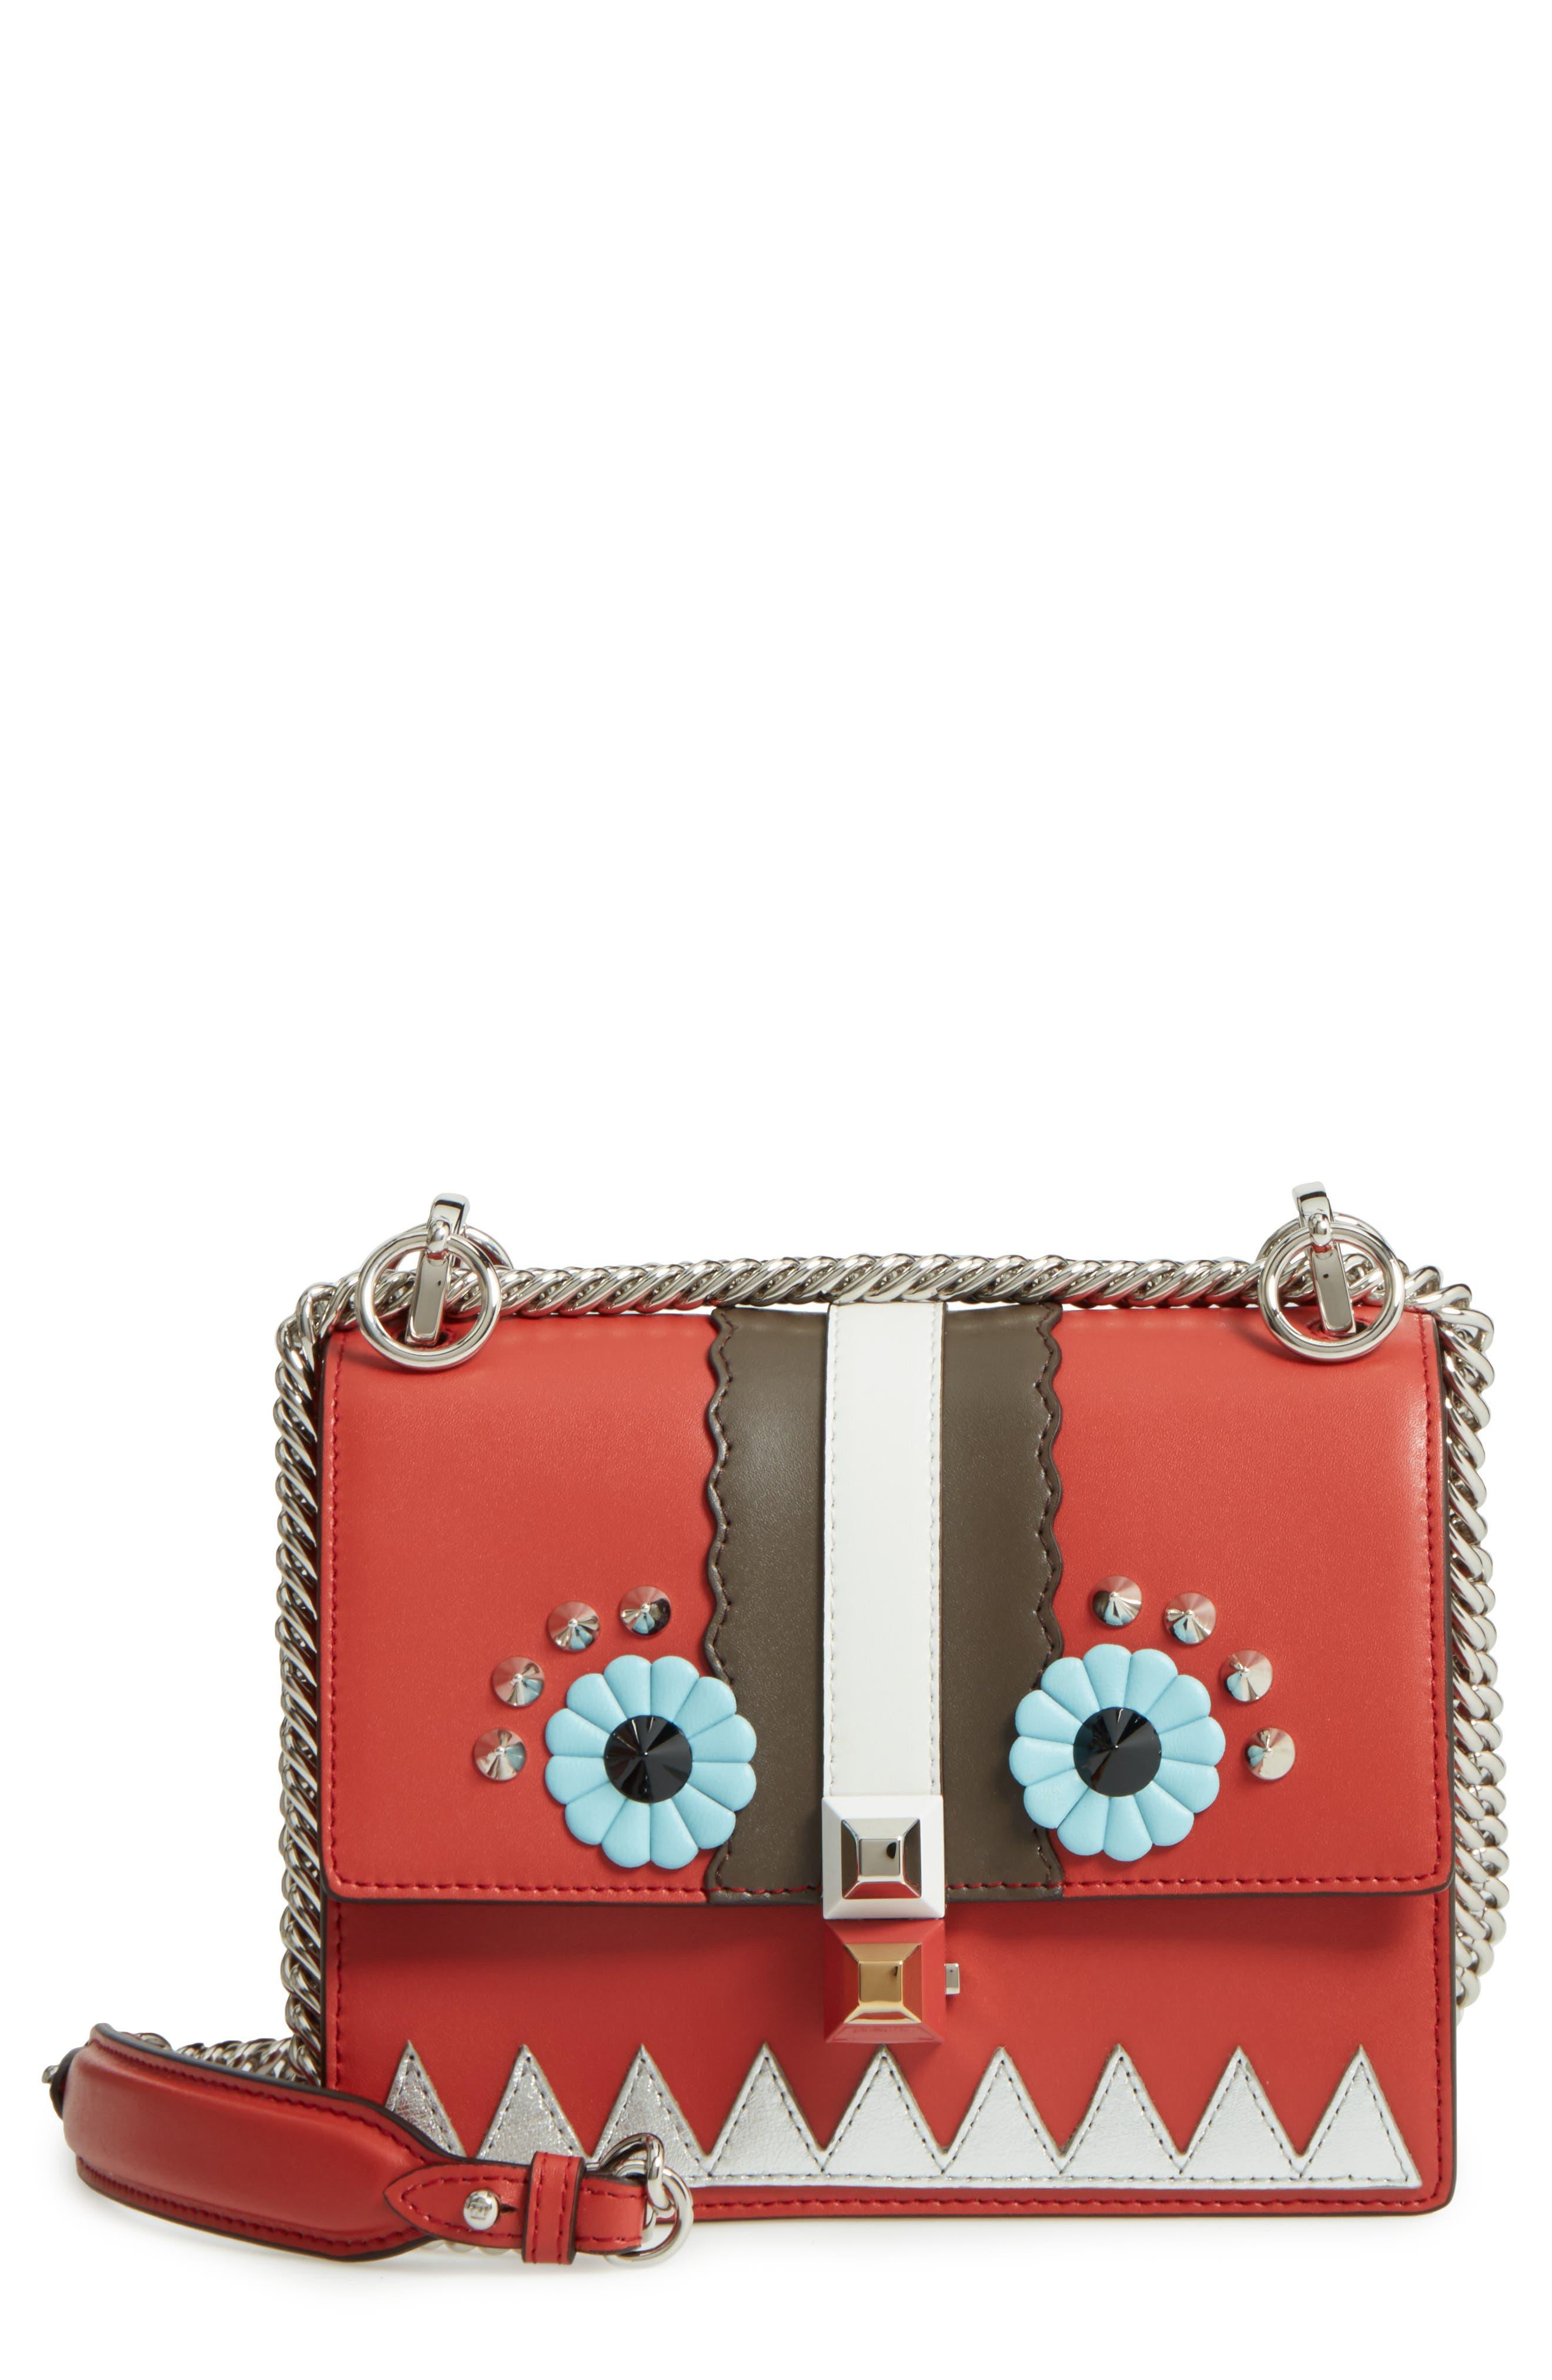 Mini Kan I Faces Leather Shoulder Bag,                             Main thumbnail 1, color,                             644